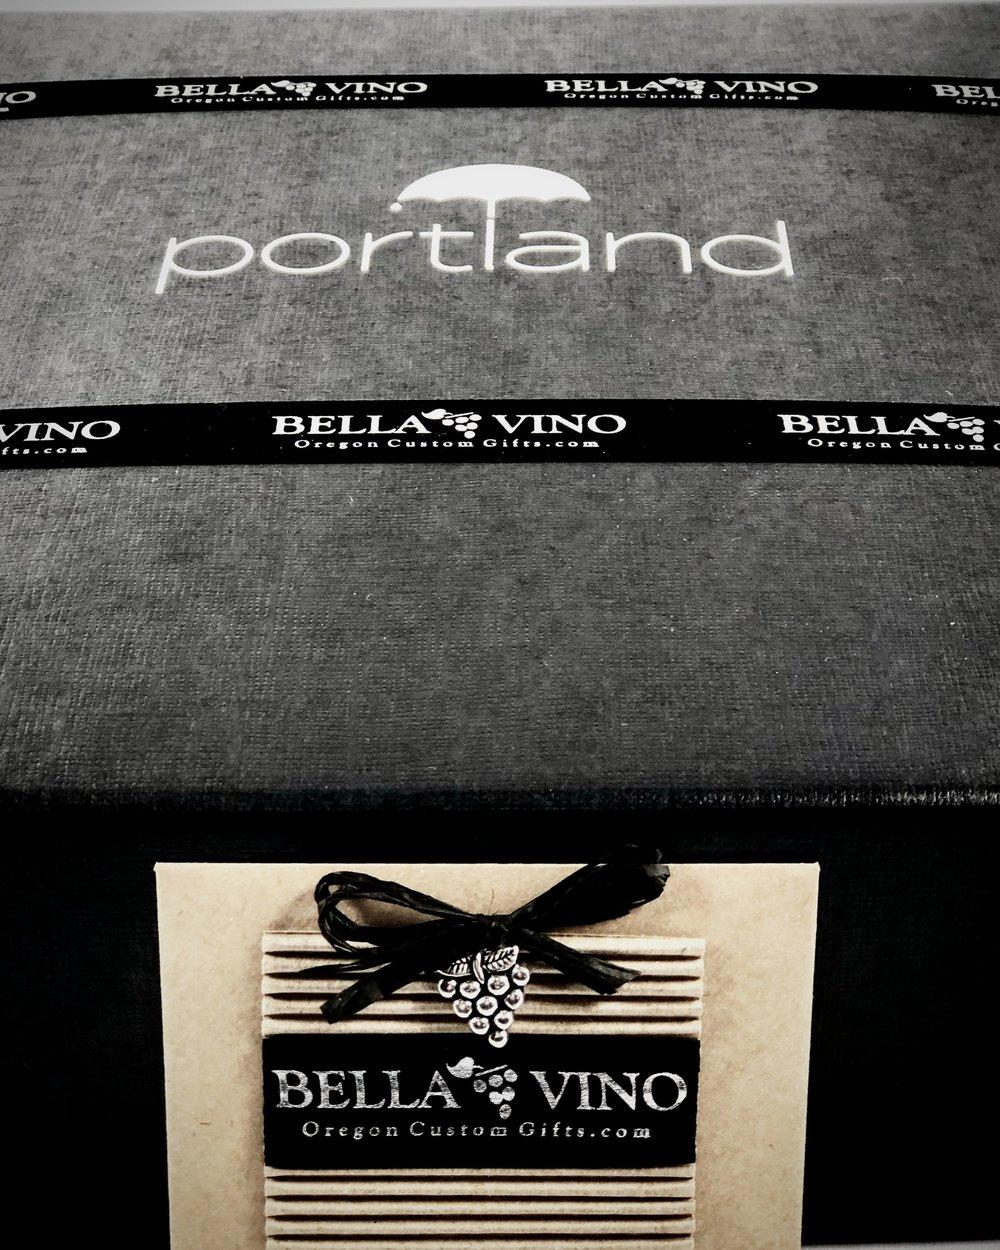 Portland+gift+box+bella+vino+gifts+%282%29.jpg